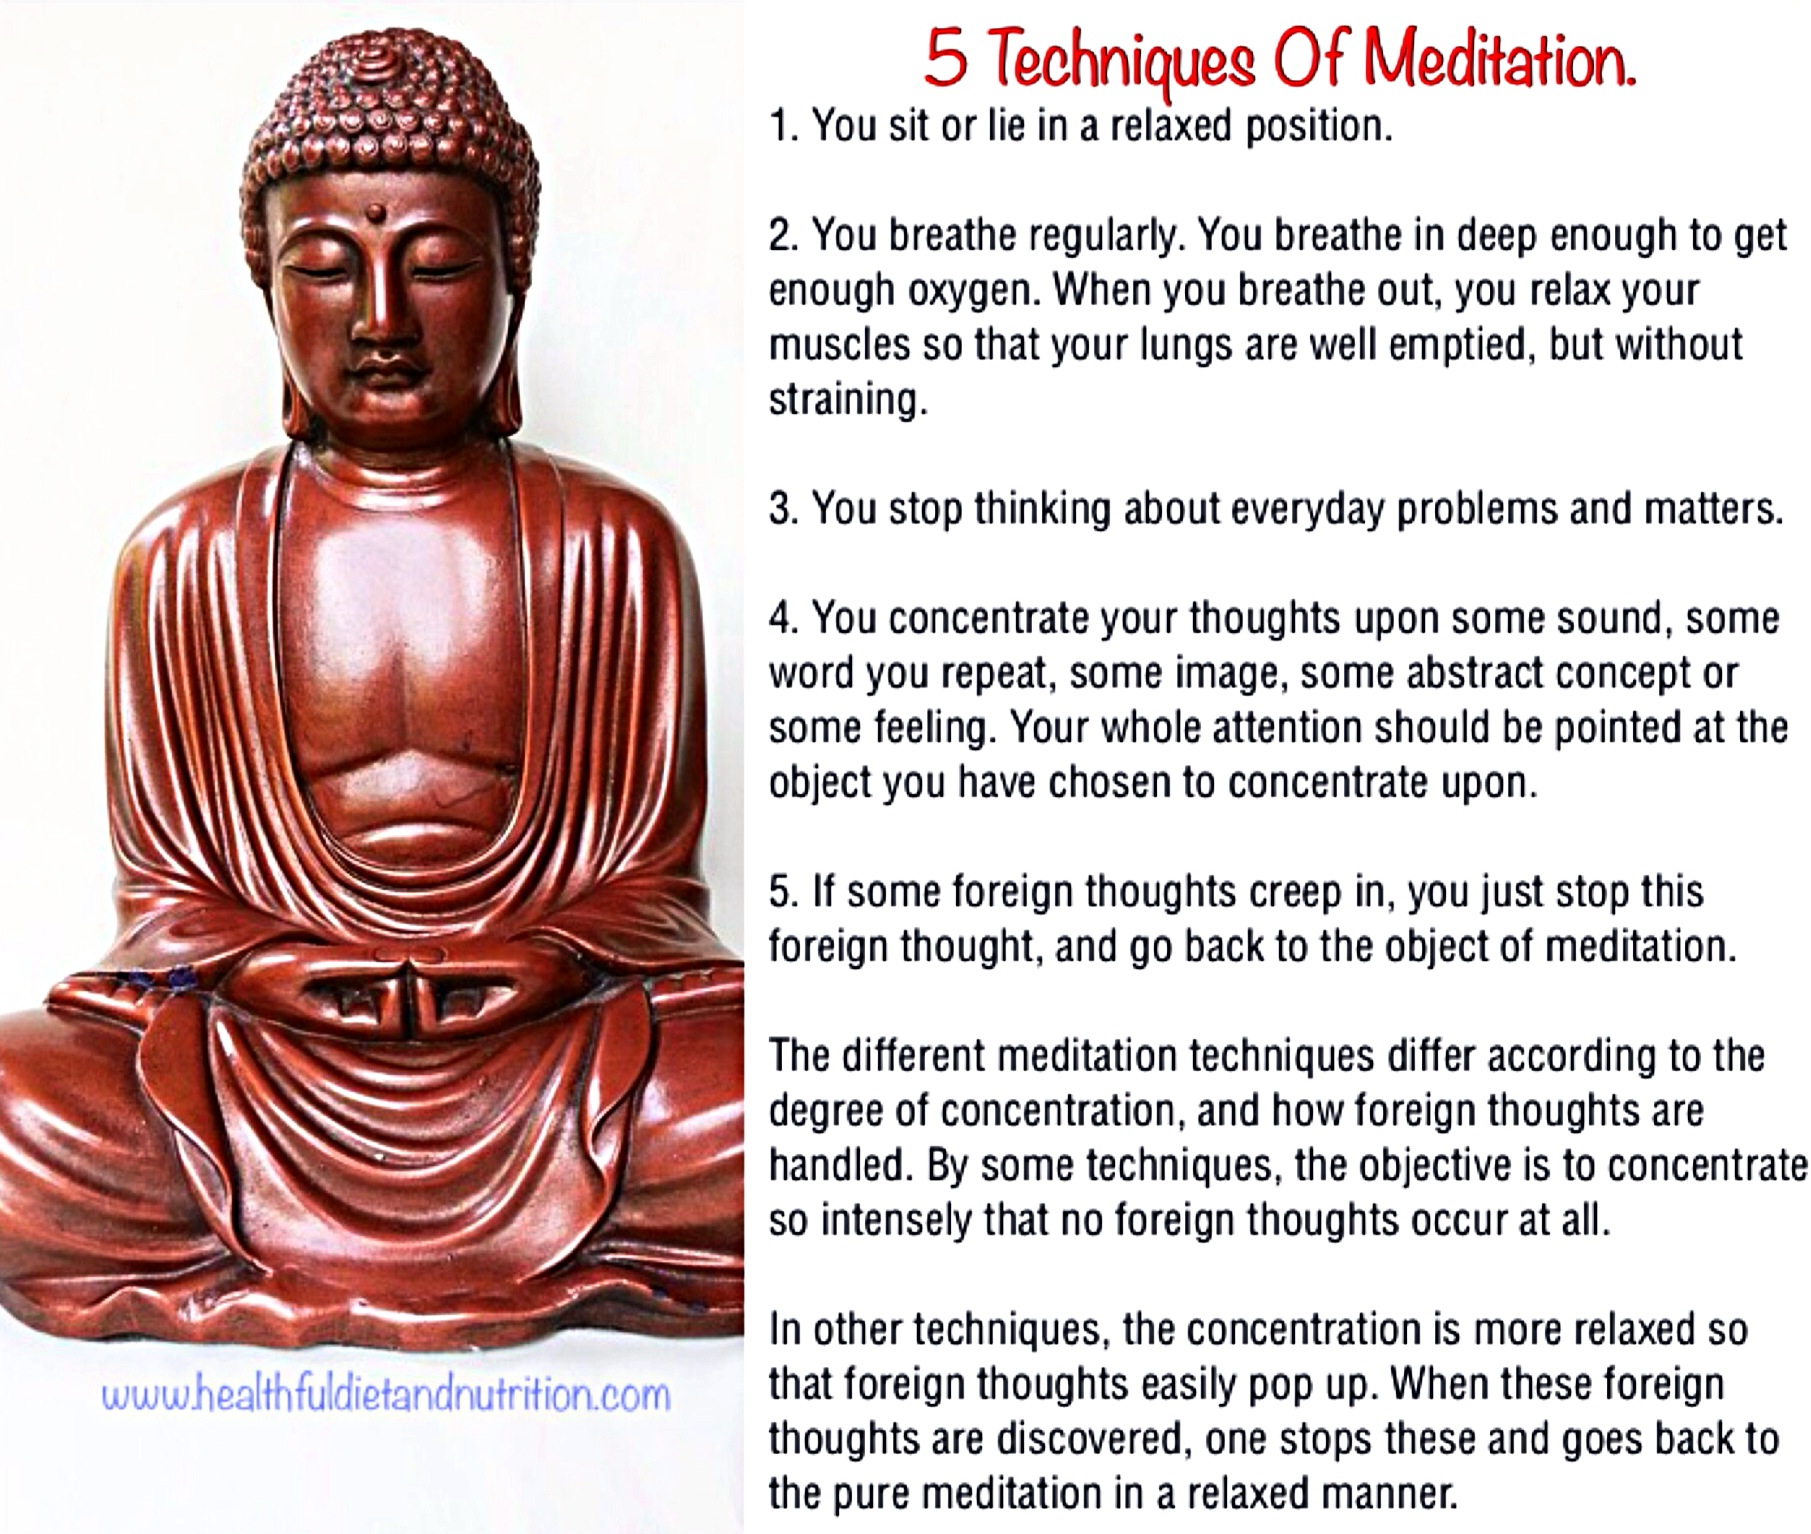 5 Techniques Of Meditation